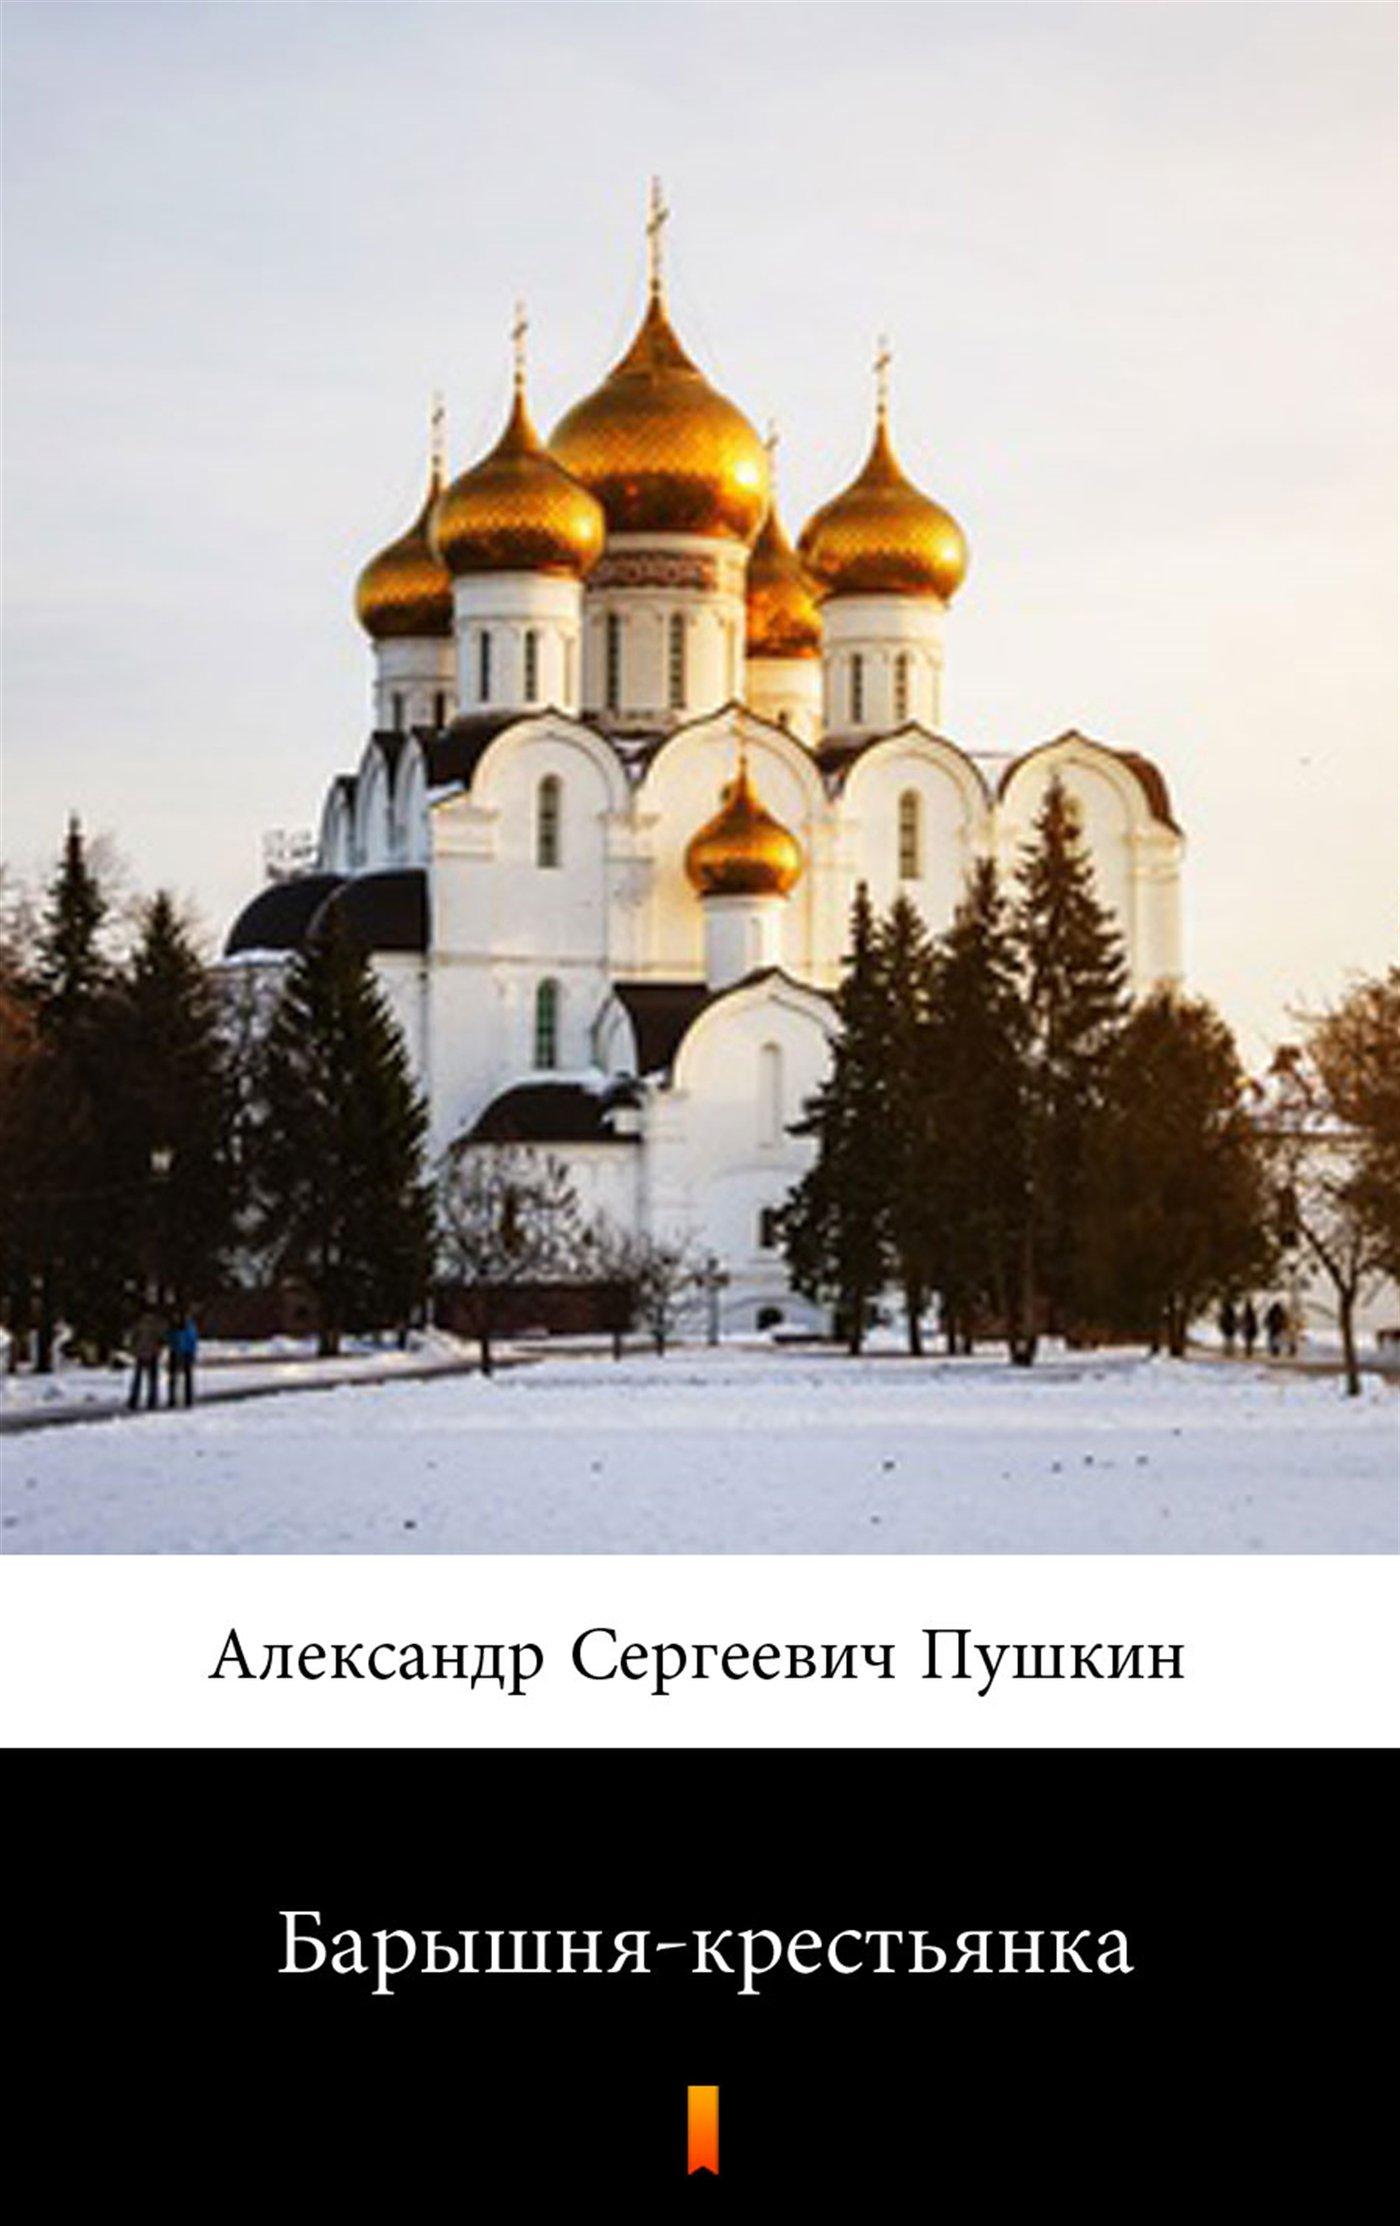 Барышня-крестьянка - Ebook (Książka EPUB) do pobrania w formacie EPUB